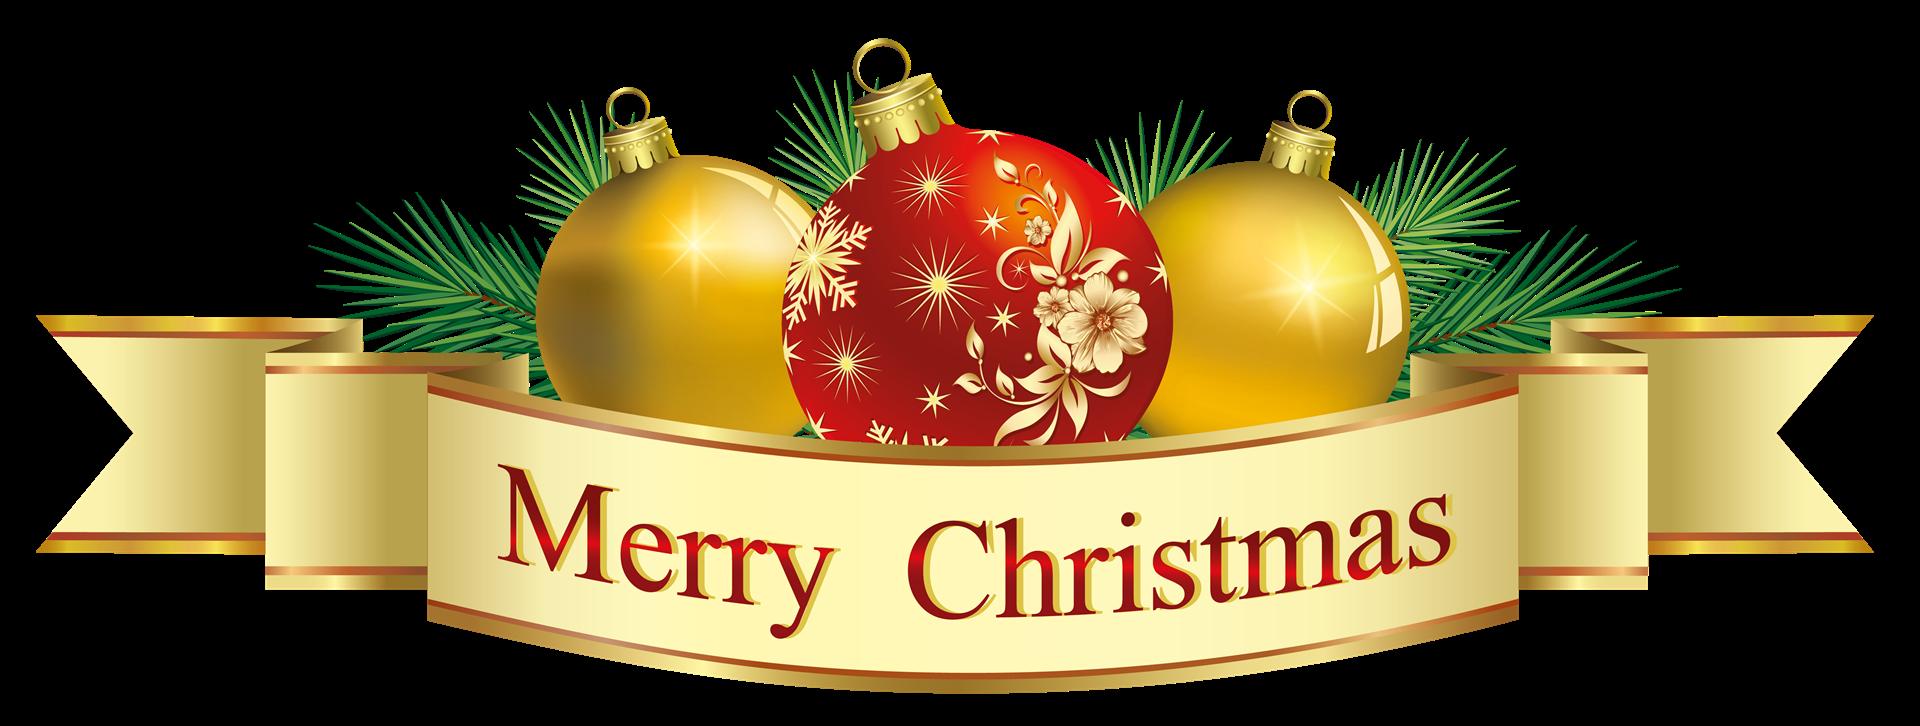 Transparent_Merry_Christmas_Deco_Clipart (Large)